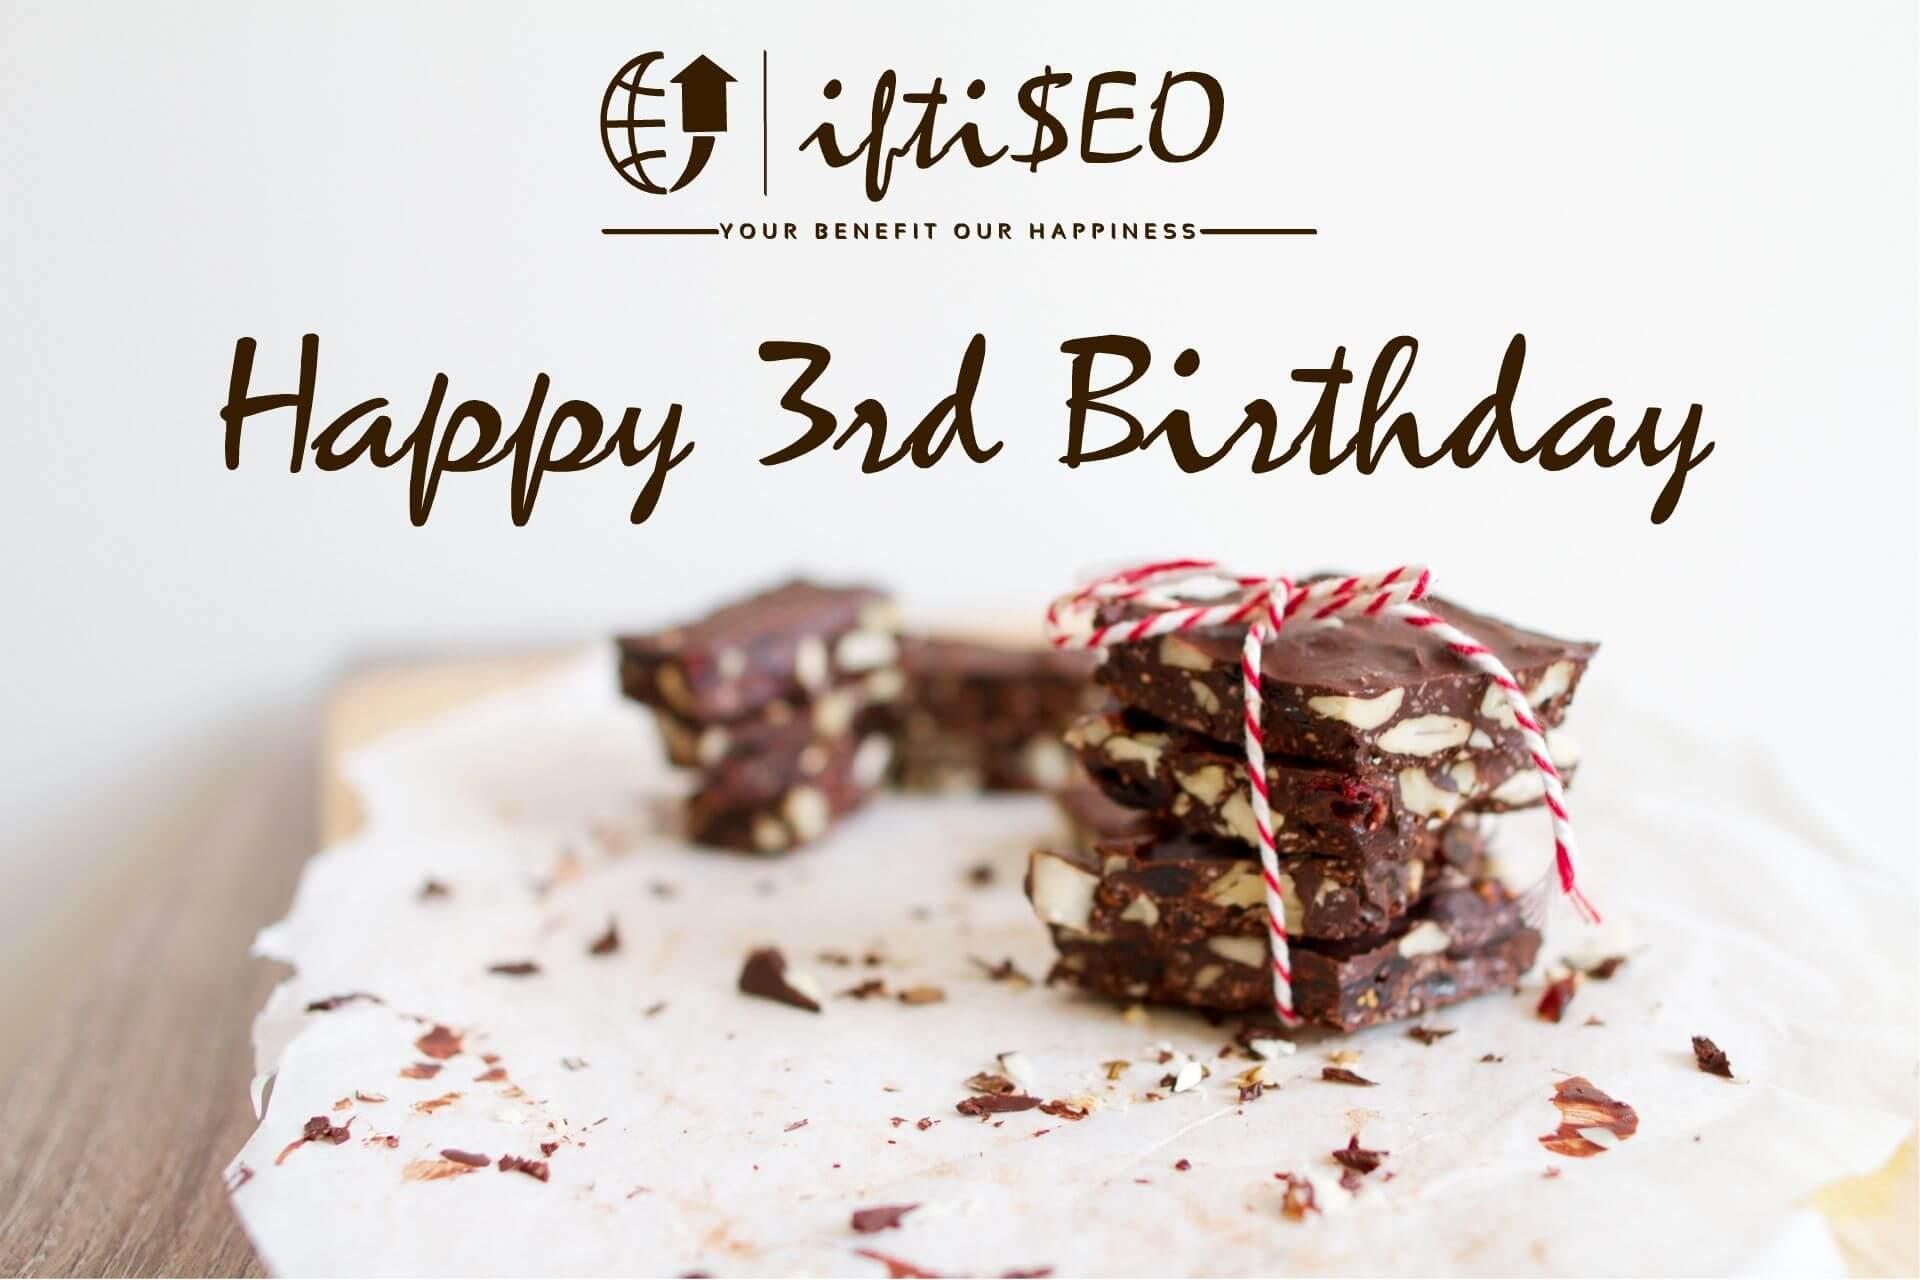 Happy-3rd-Birthday-iftiSEO